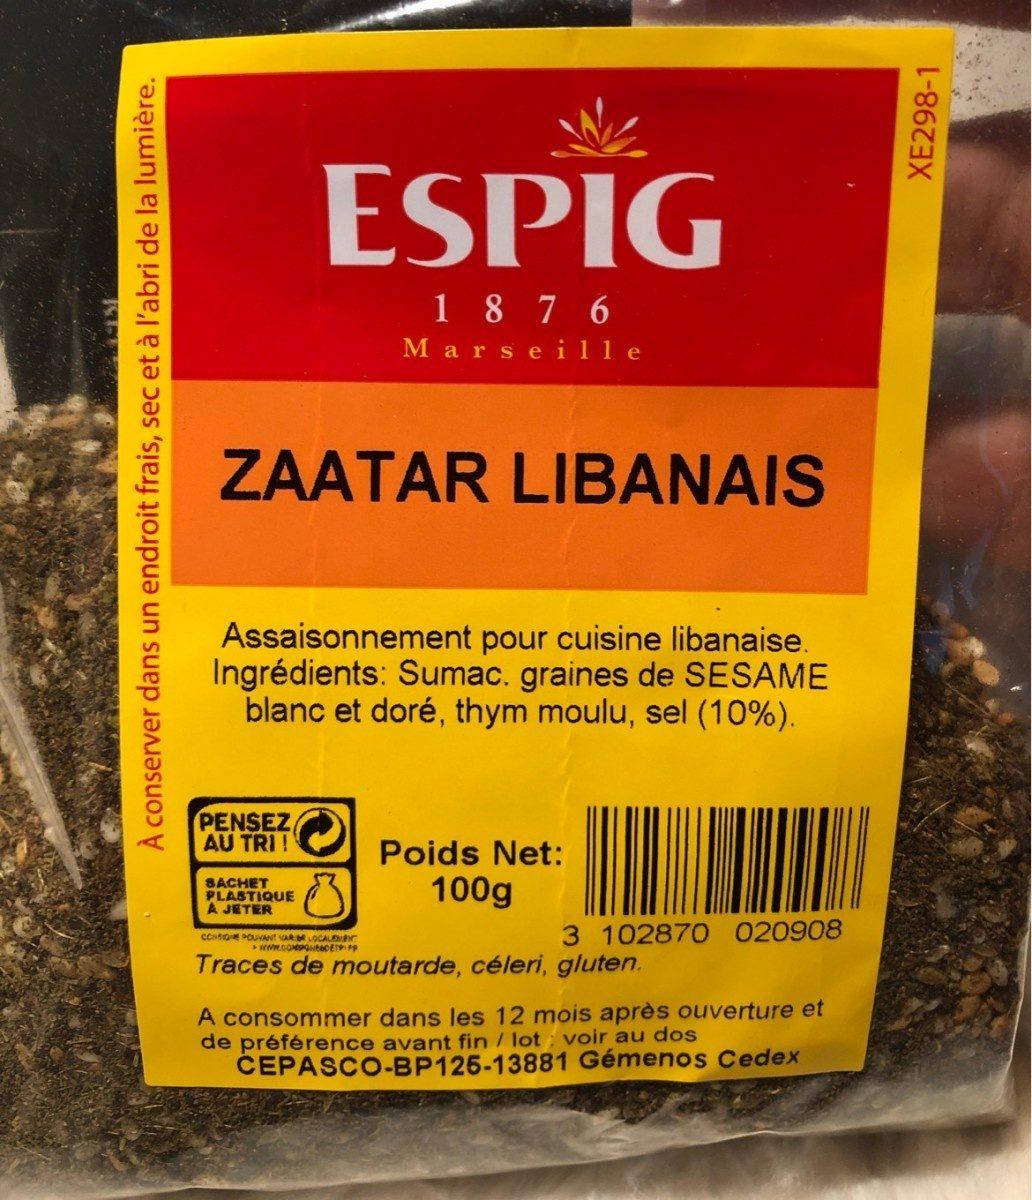 Zaatar libanais - Produit - fr